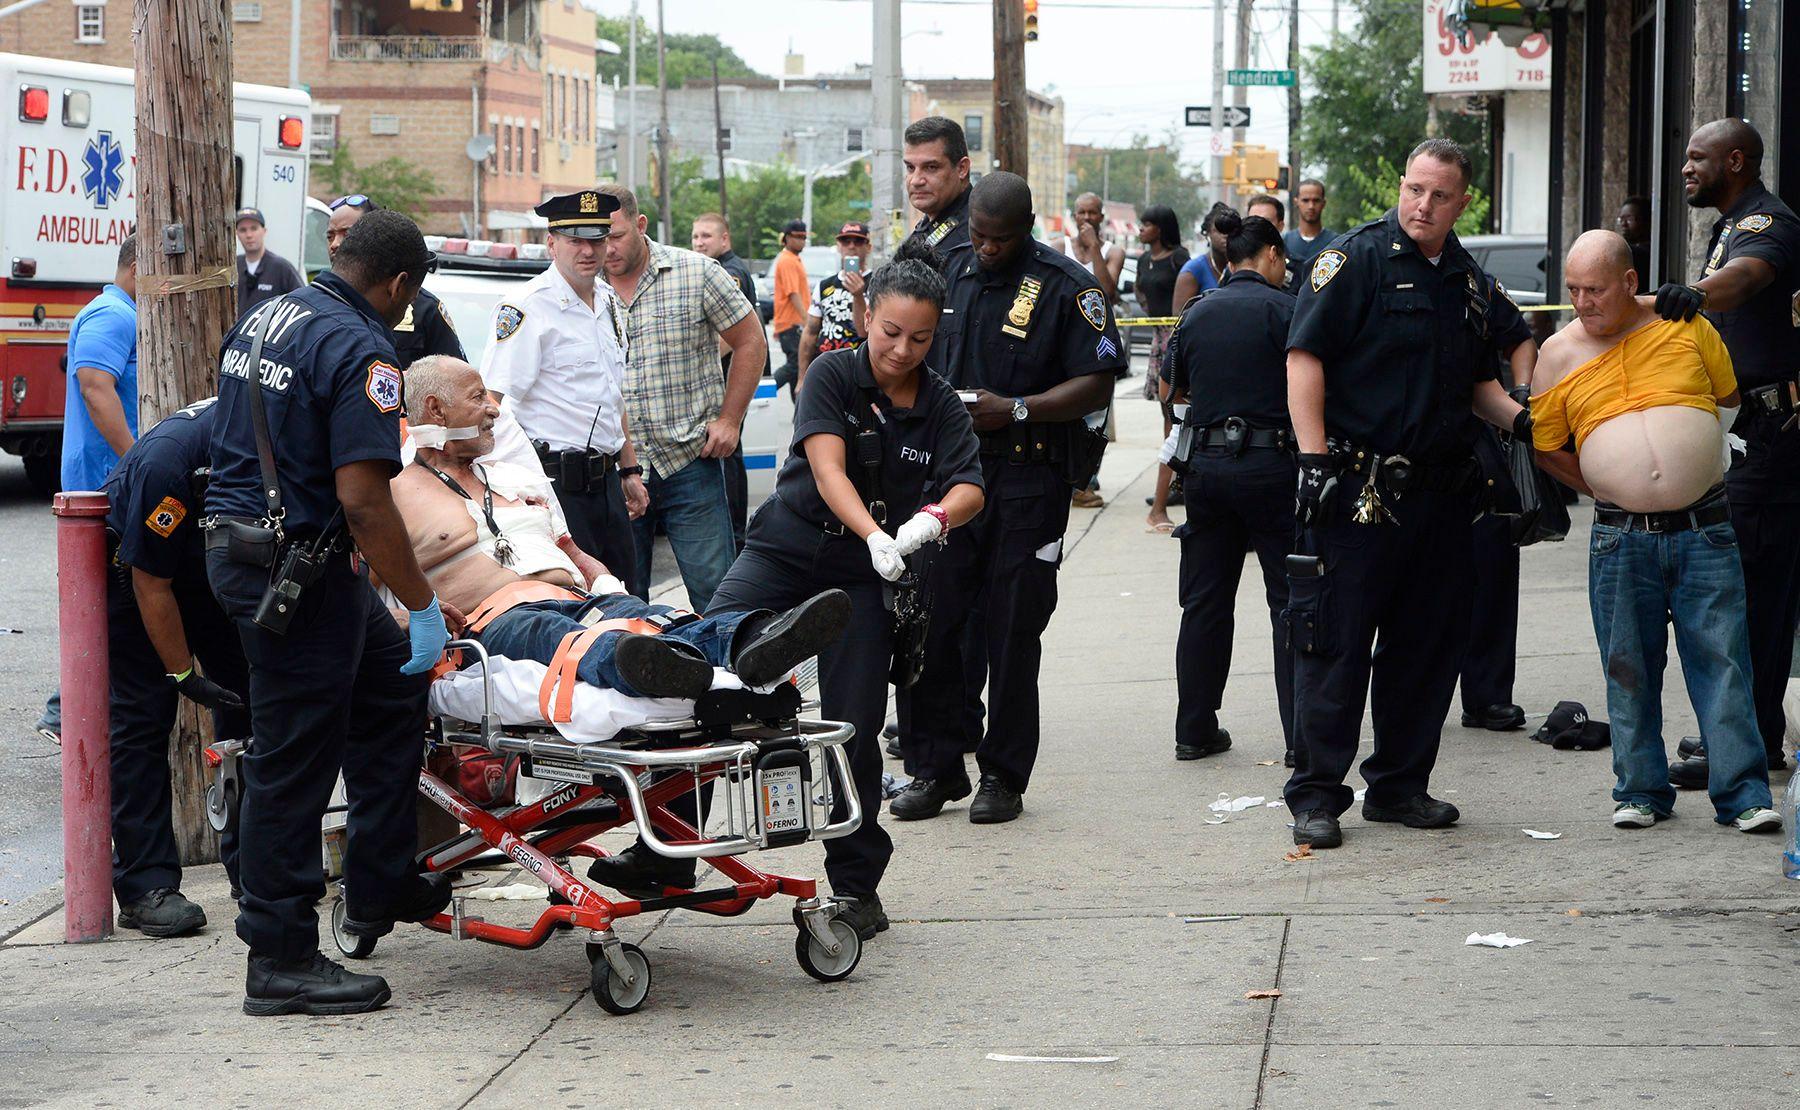 Brooklyn stabbing